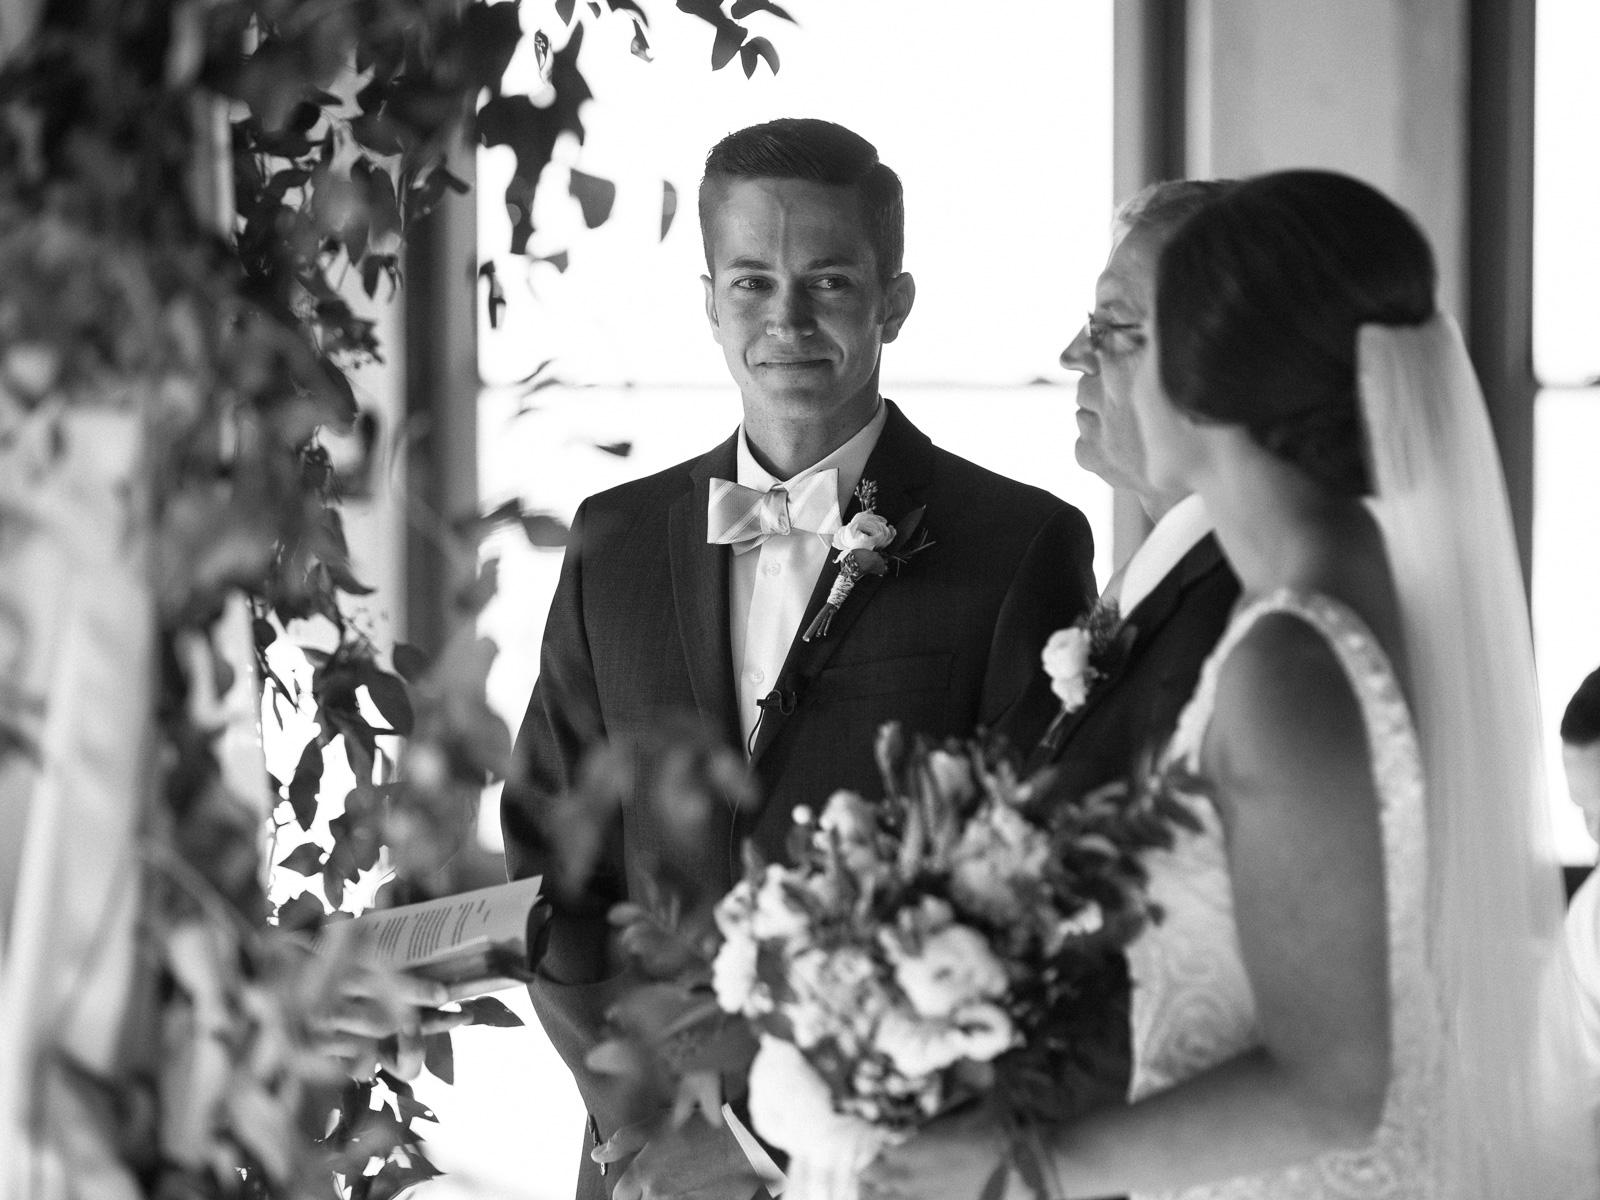 OKC rooftop wedding josh mccullock-9925.jpg